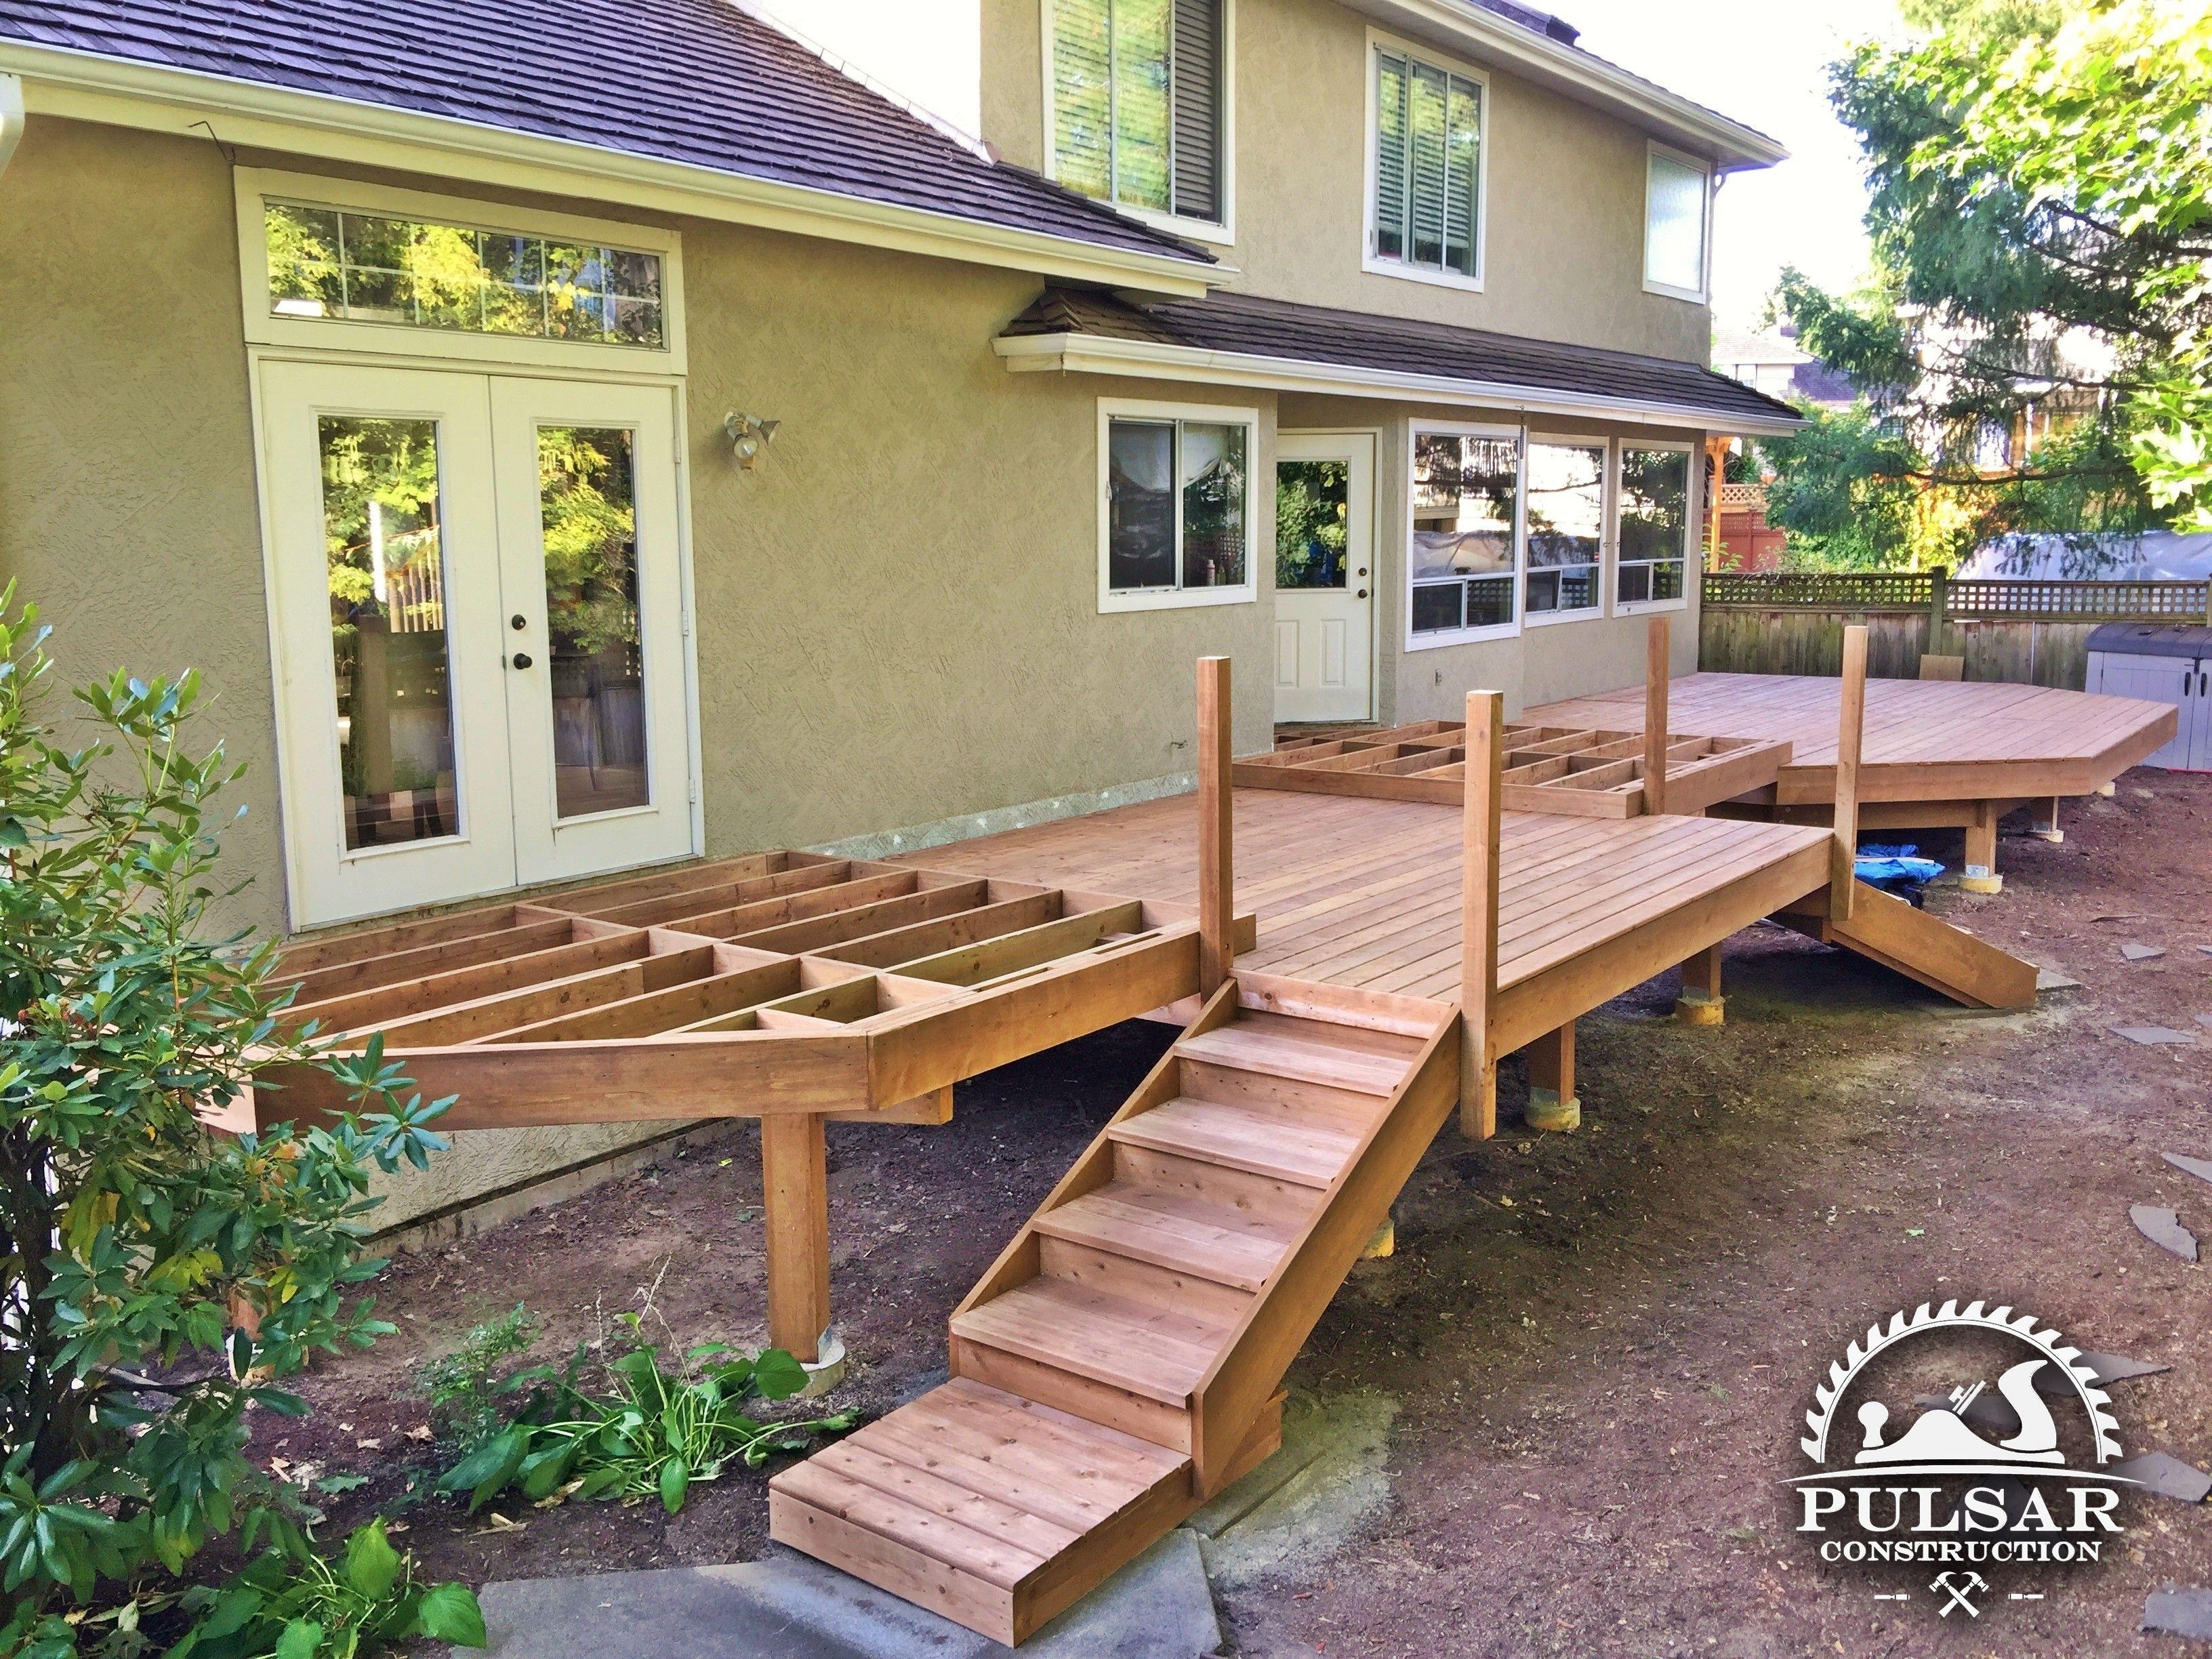 Split-Level Deck Framing | Building a deck, Patio deck ... on Split Level Backyard Ideas id=44881